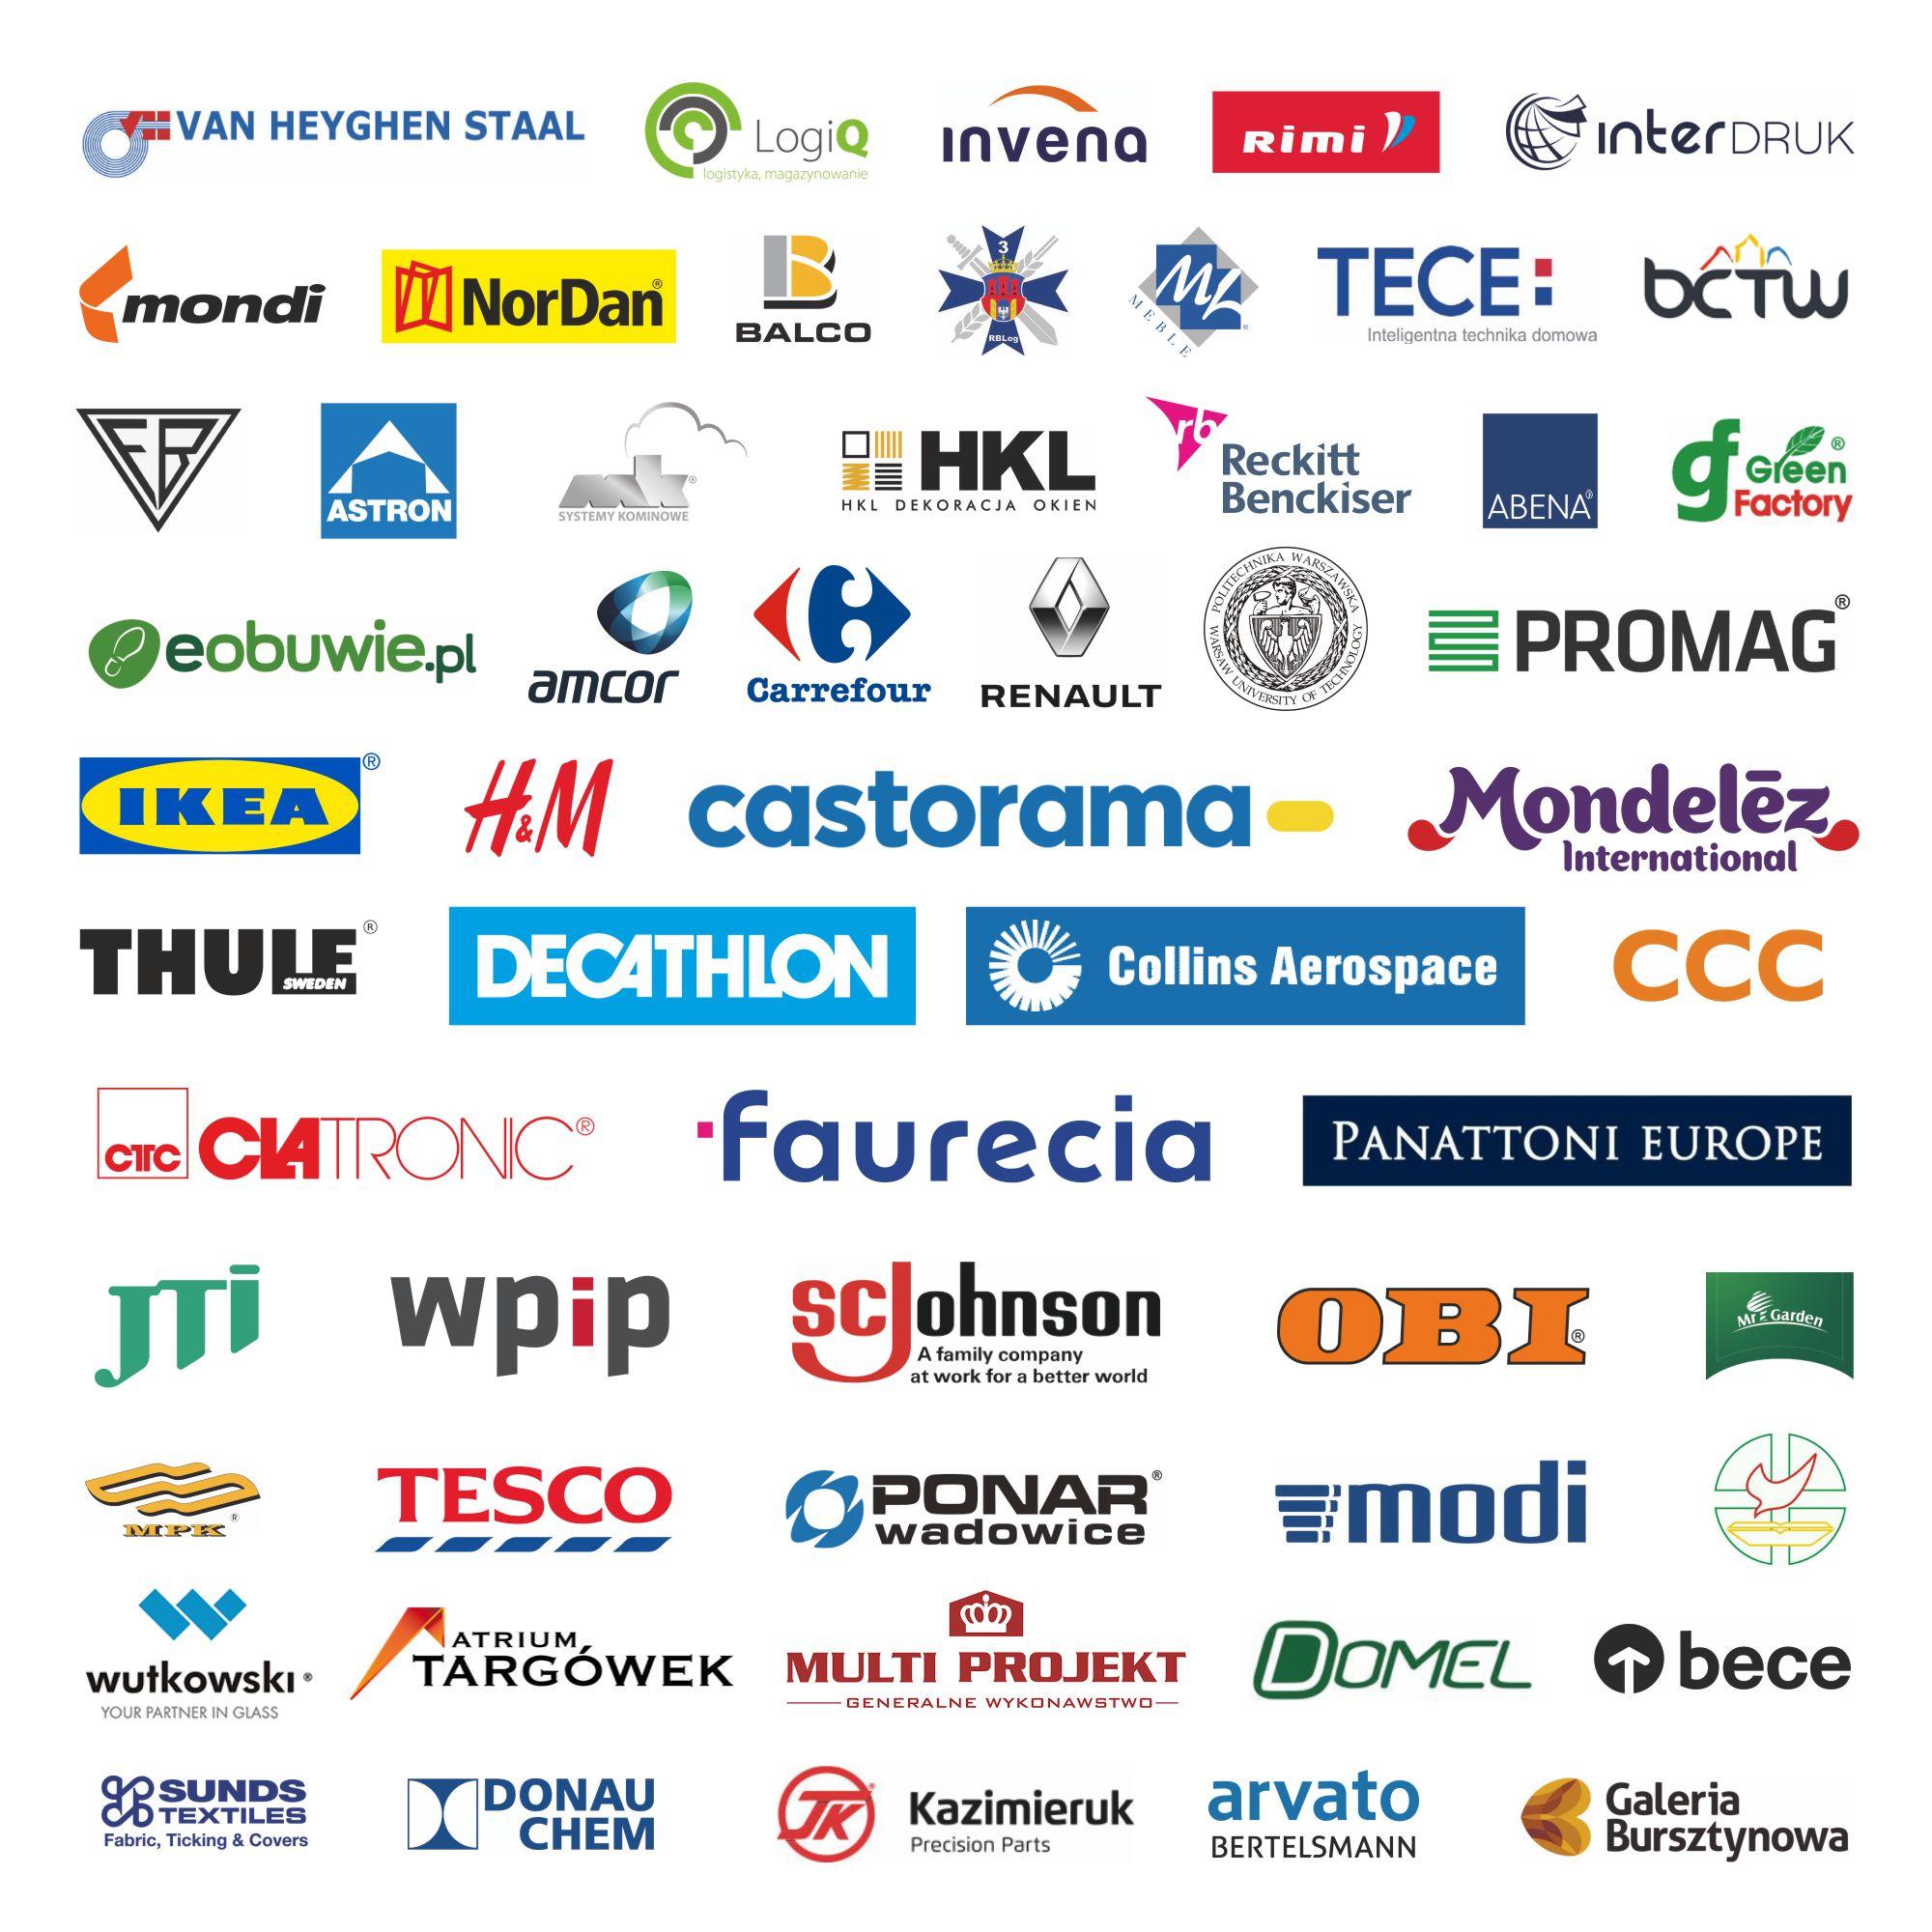 WISENE's costumers logos: Panattoni Europe, Decathlon, Ikea, Castorama, CCC, Collins Aerospace